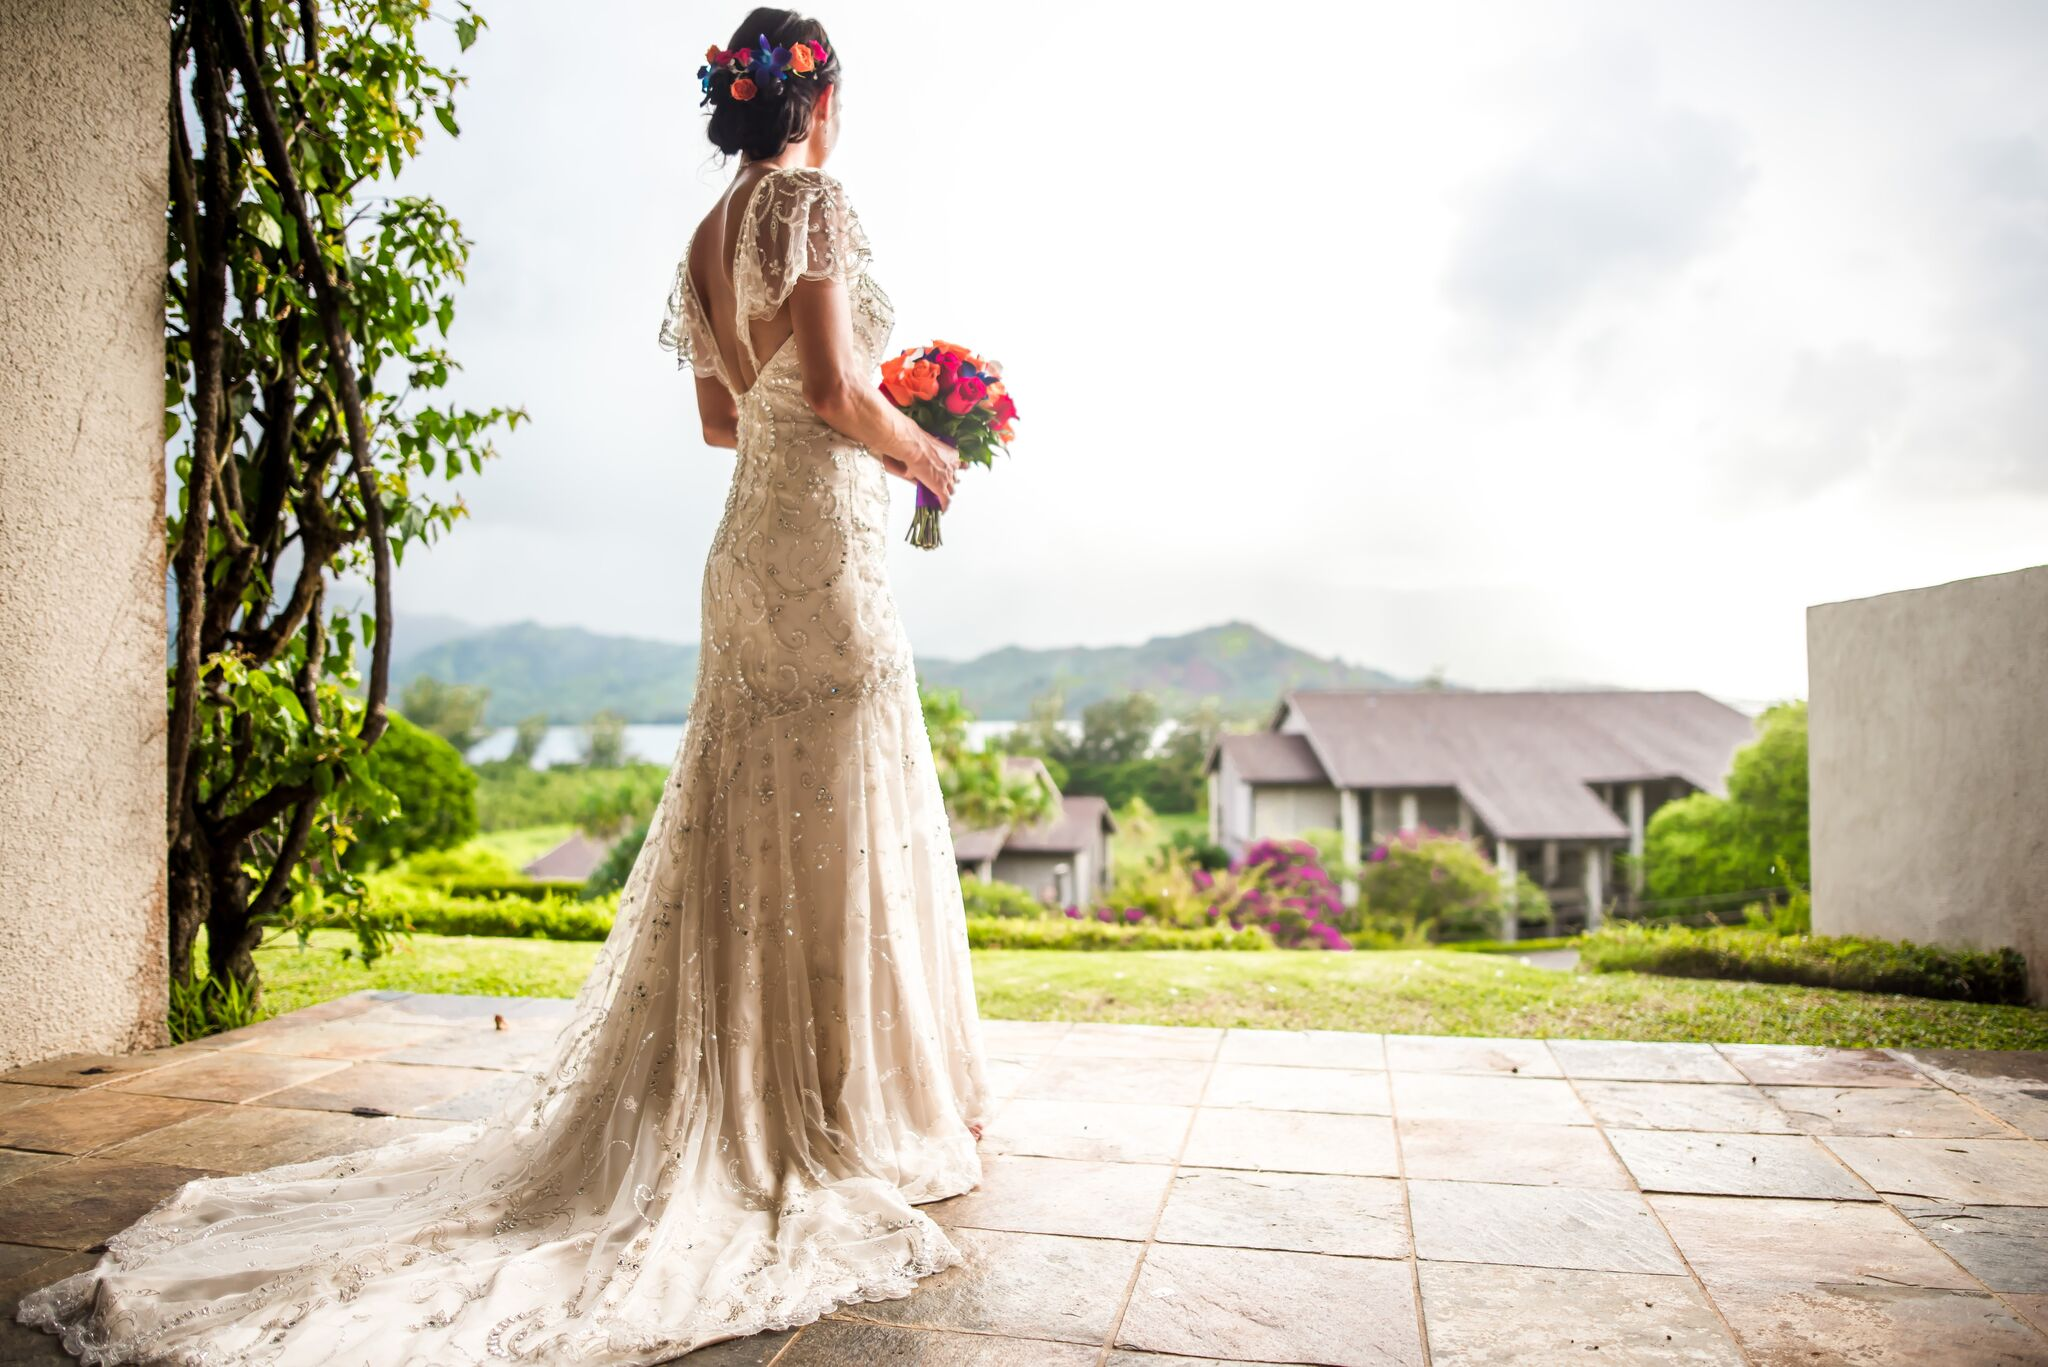 Bride with flowers looking away.